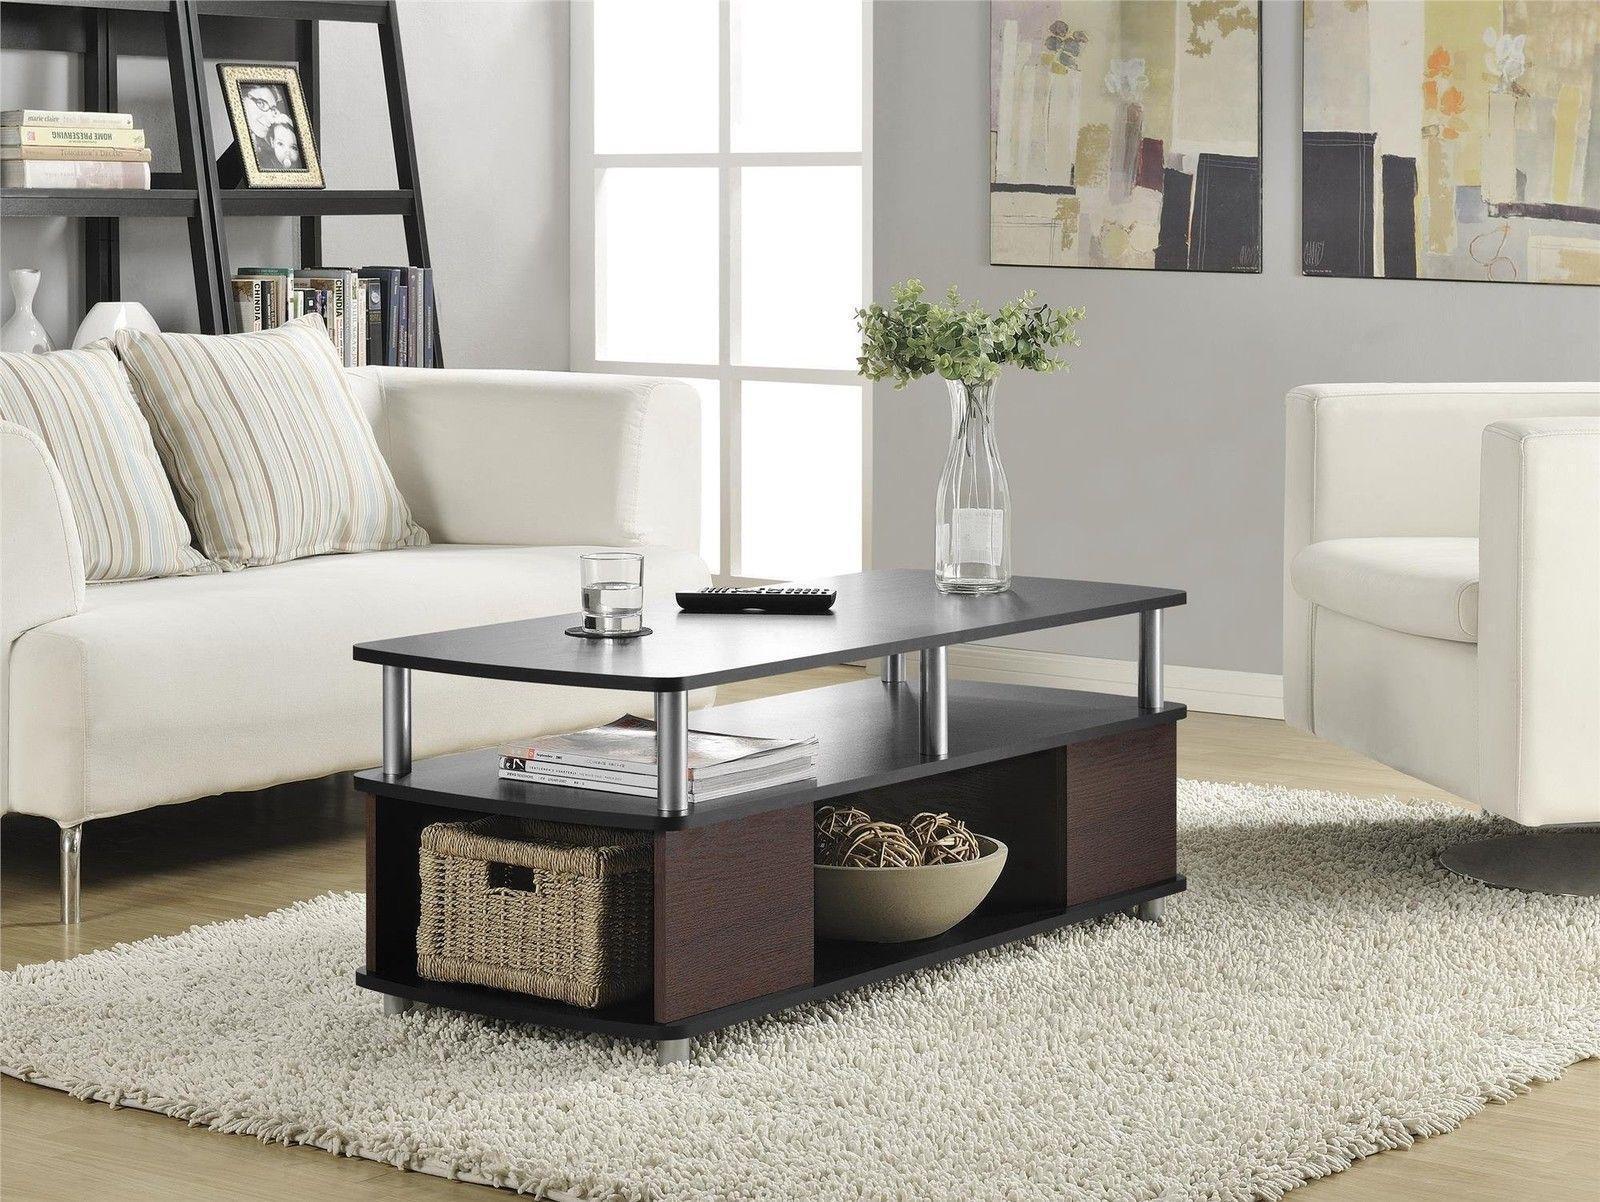 Altra Carson Living Room Furniture Black Cherry Finish Open Storage ...